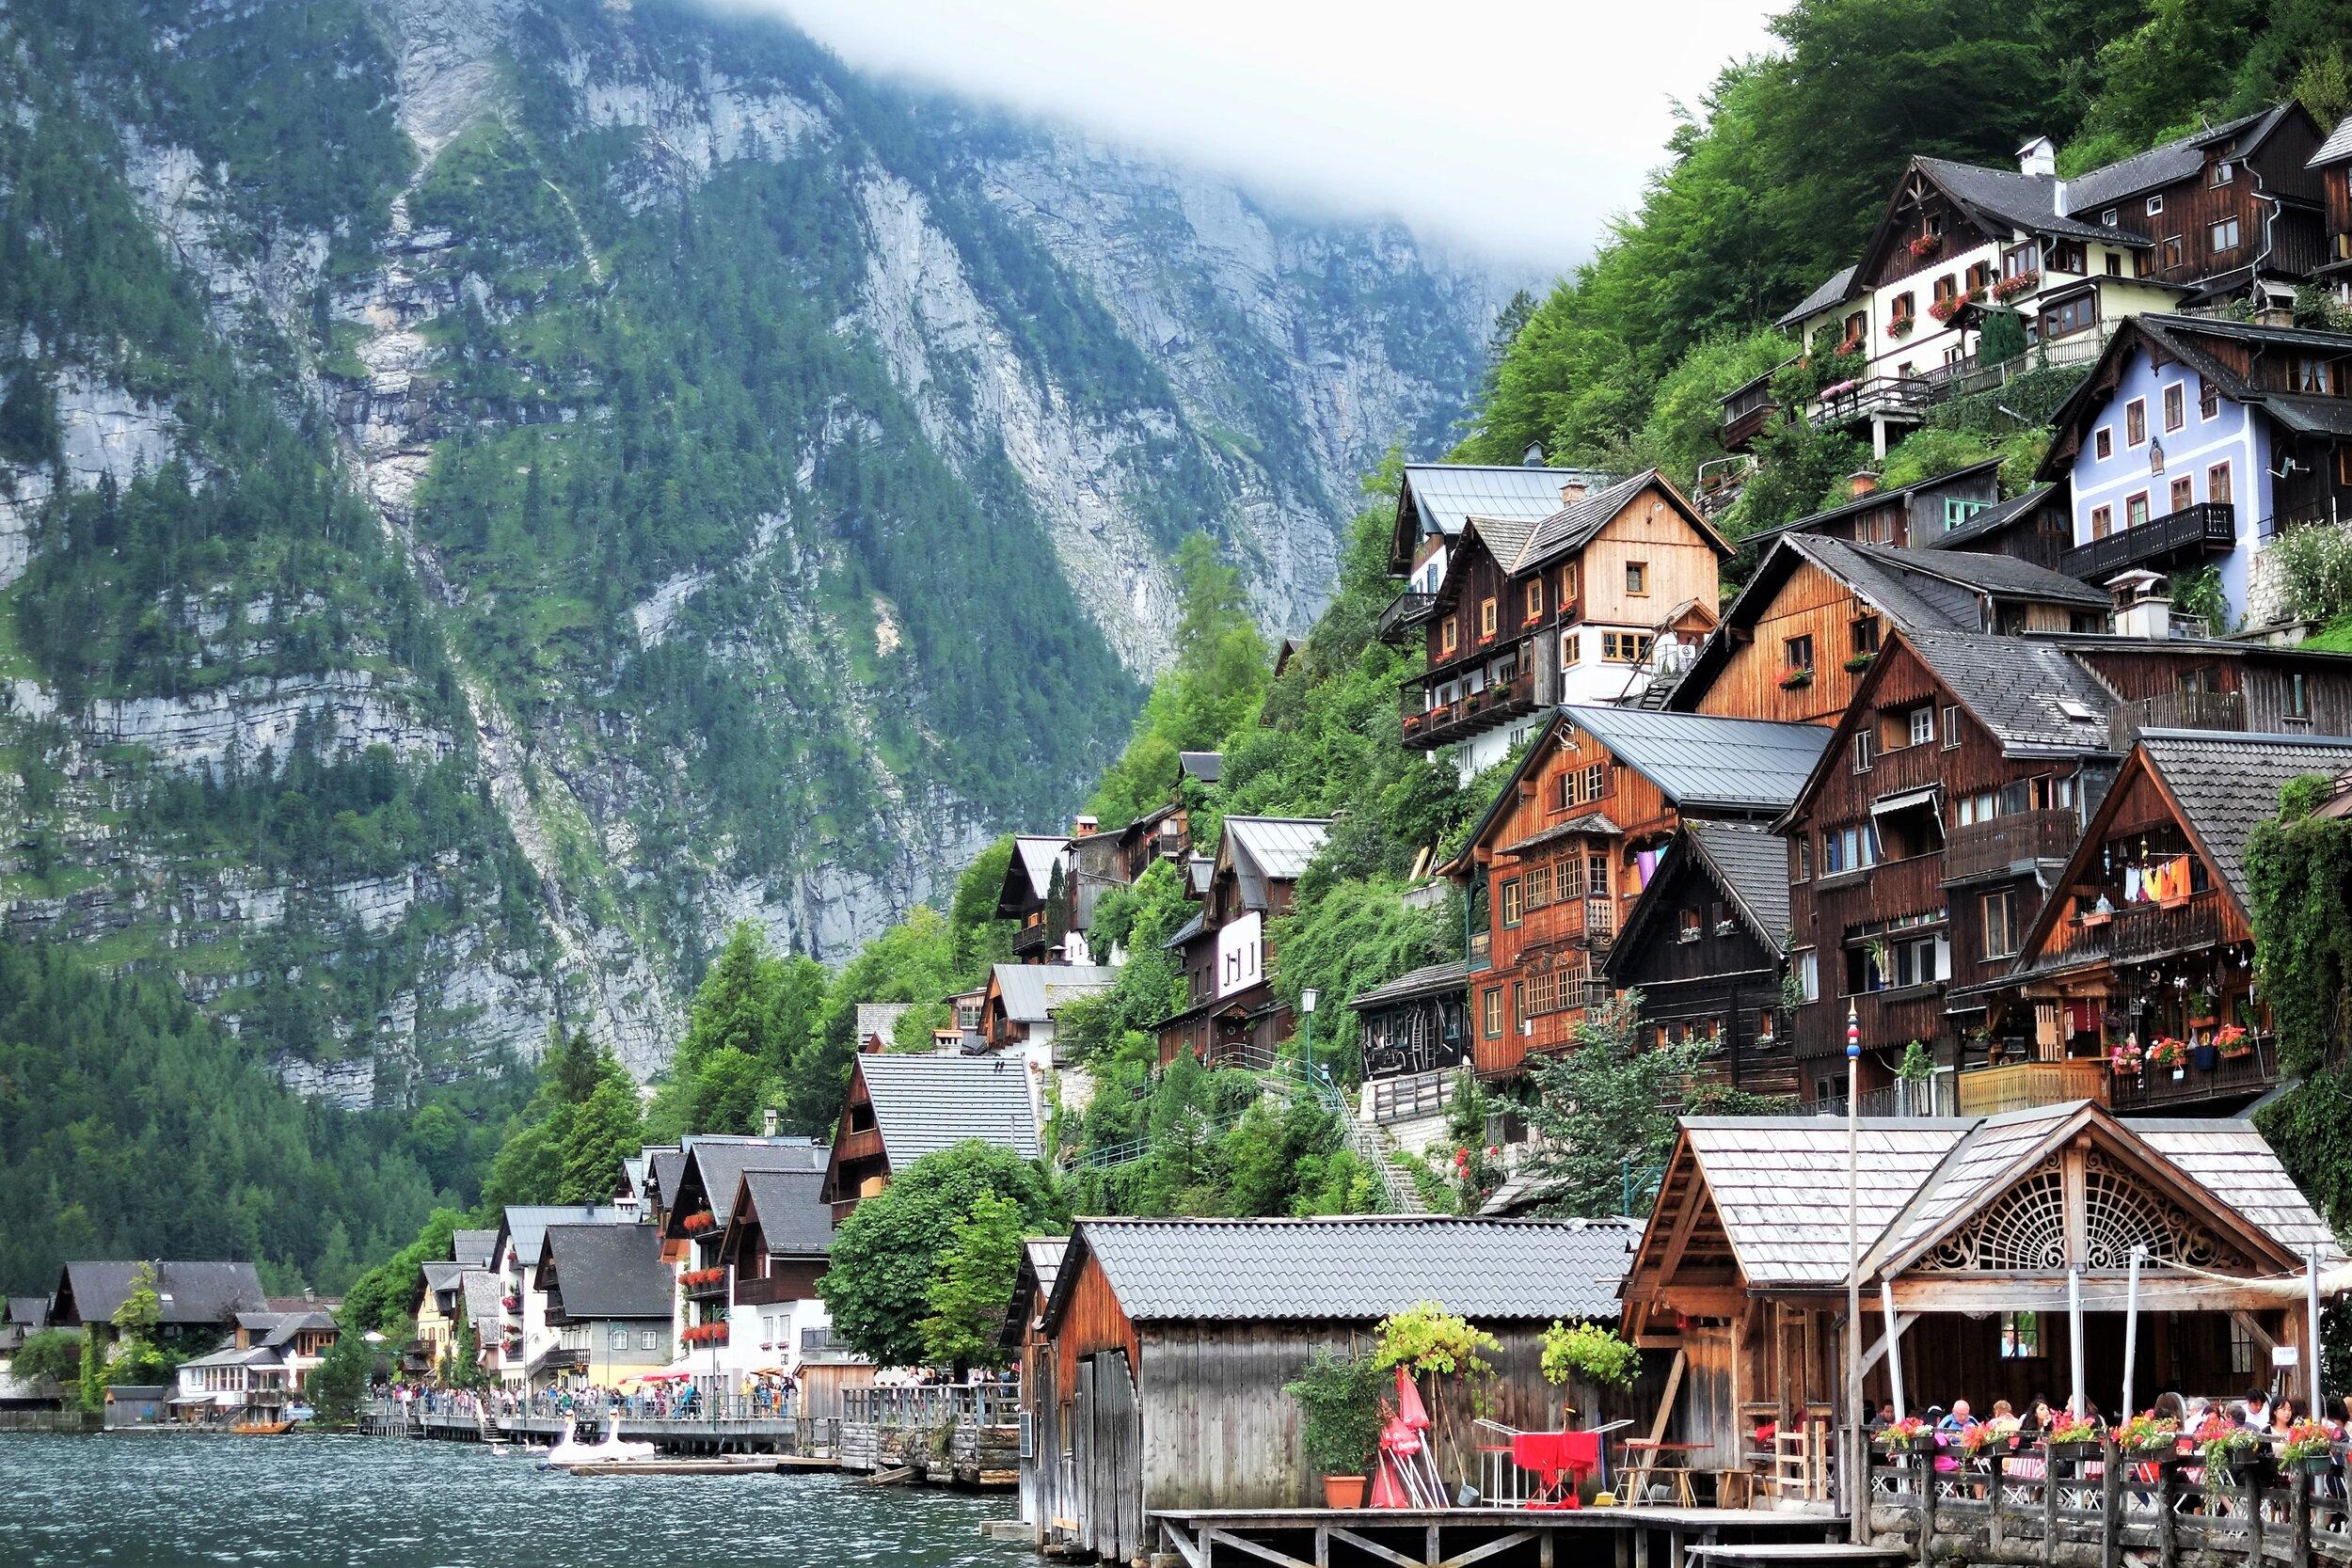 The beautiful town of Hallstatt, Austria